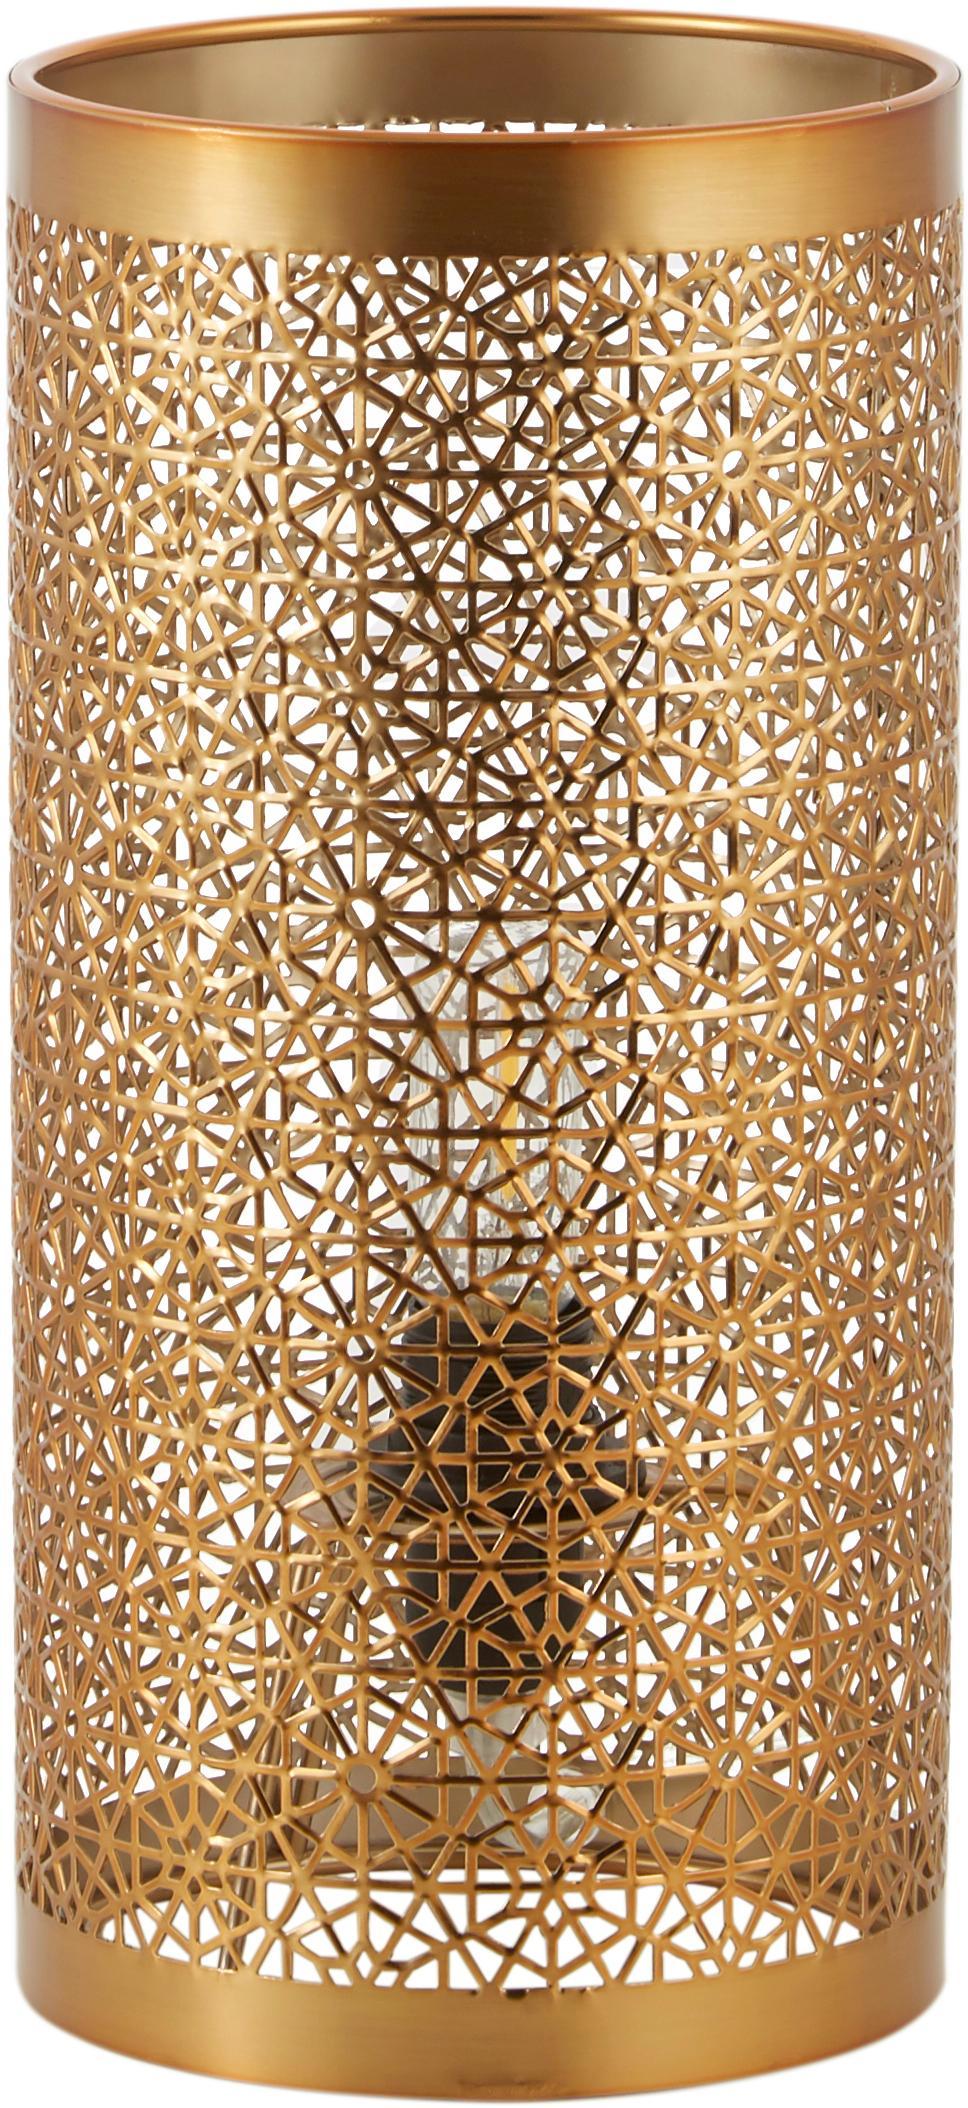 Lampada da tavolo Hermine, Ottone, Ottone opaco, Ø 14 x Alt. 28 cm